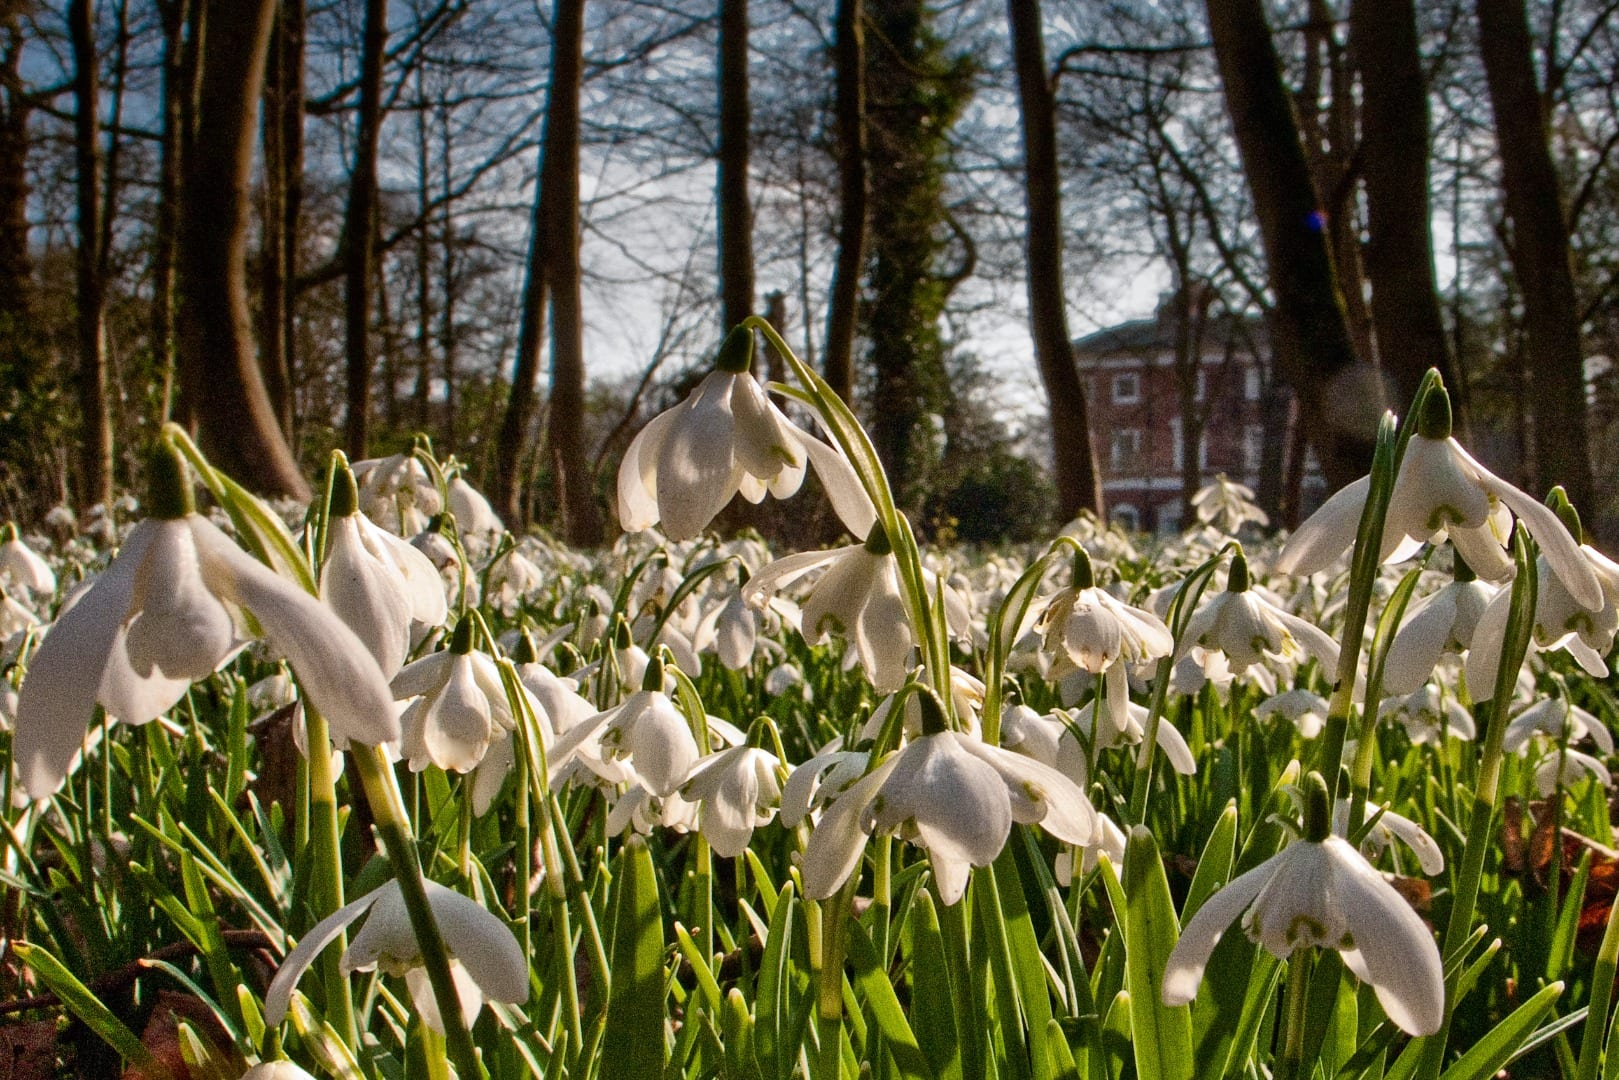 Snowdrop Sundays - what's on at Lytham Hall